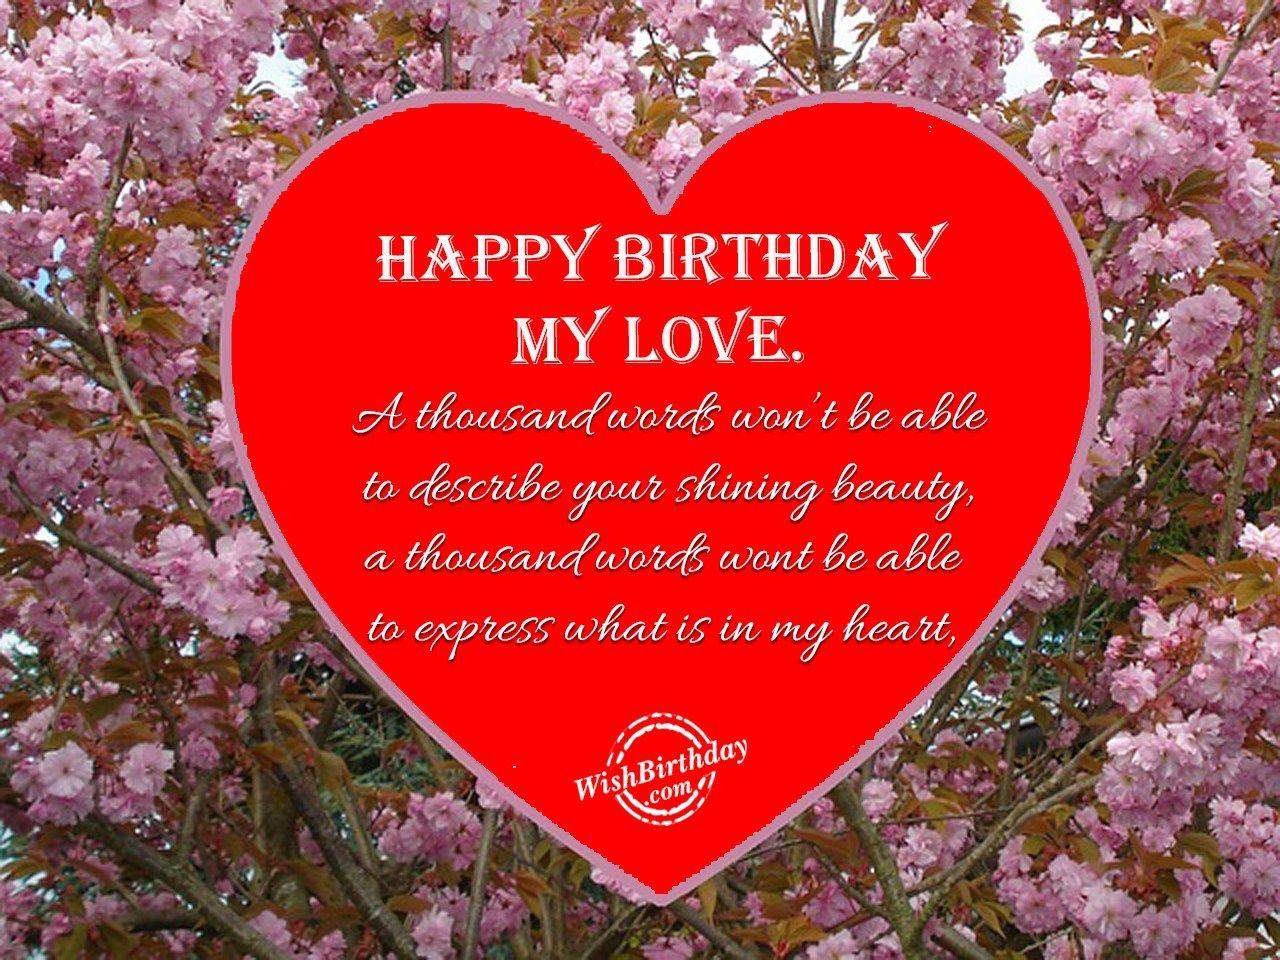 Happy Birthday Wishes For Wife ~ Happy birthday wishes for colour ful wifehappy birthday wishes for